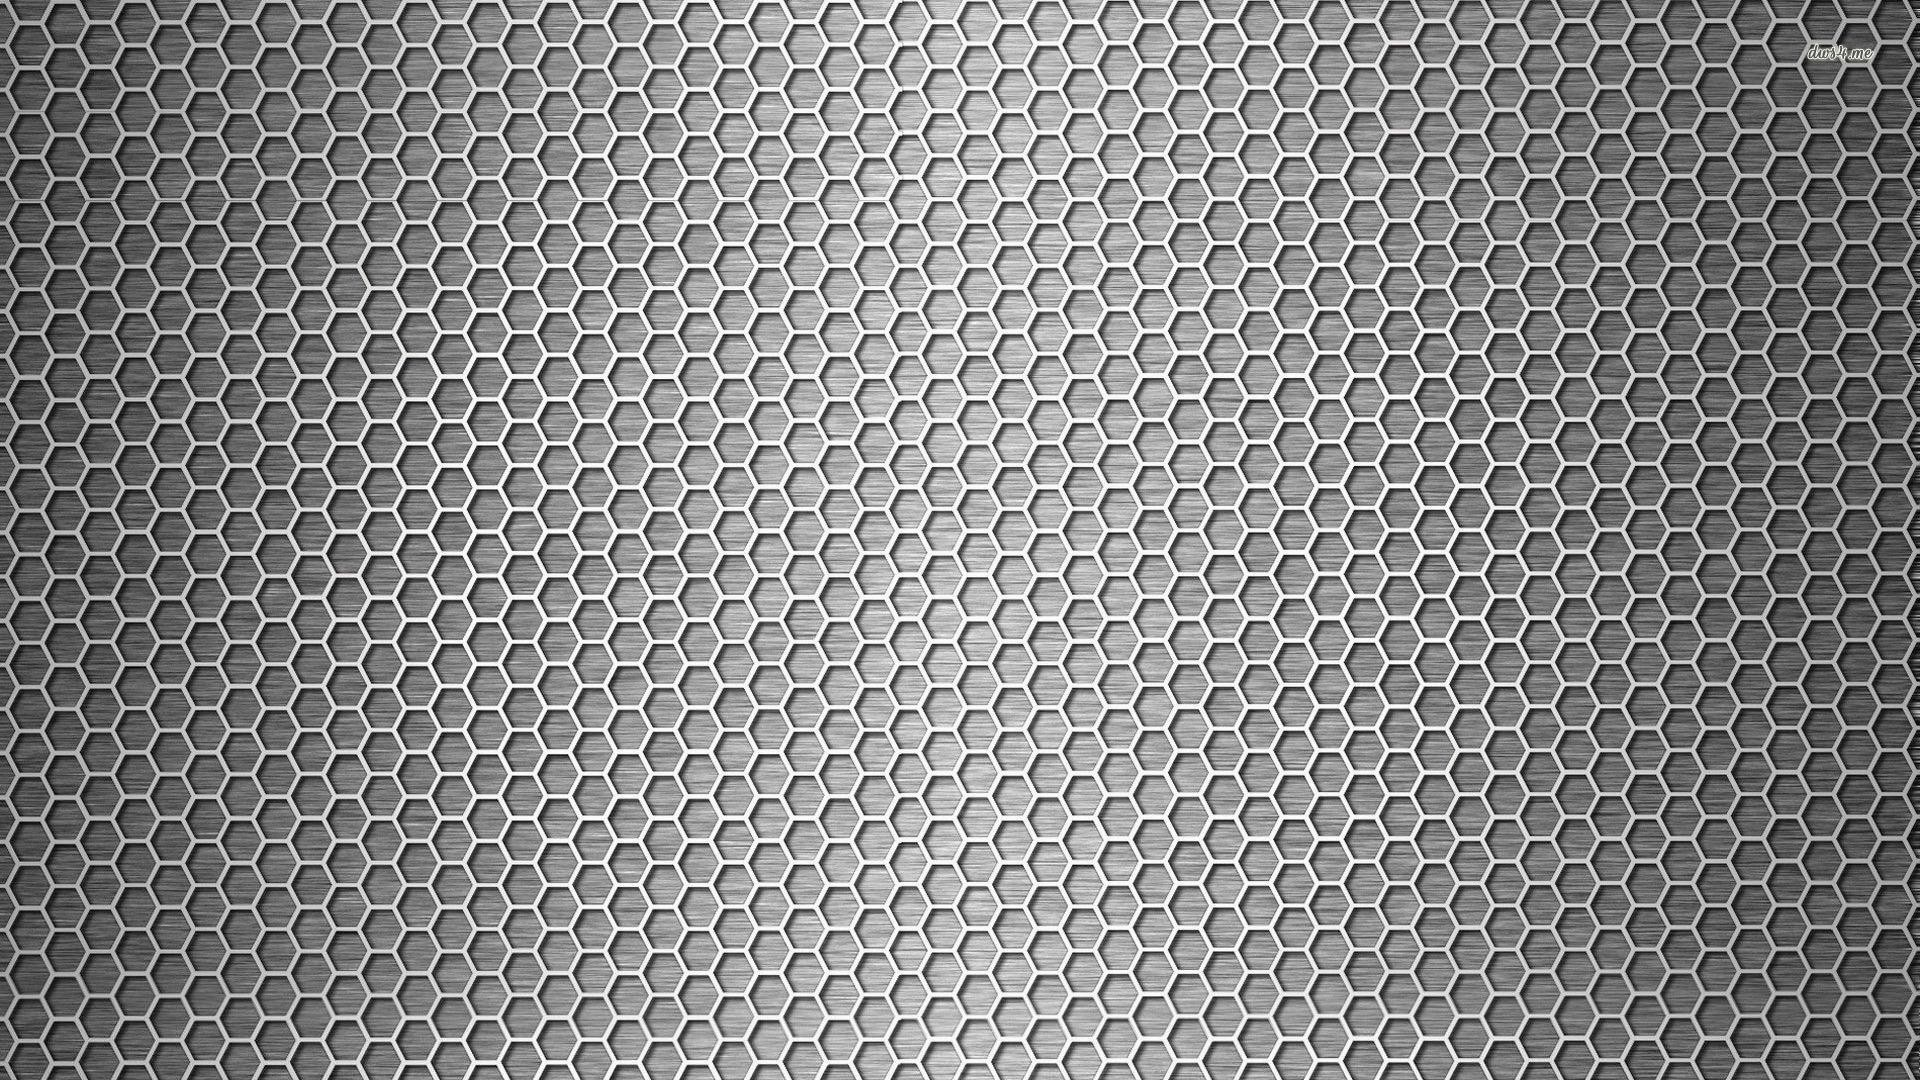 Carbon-Fiber-Gryffin-By-Betahouse-HD-desktop-1920%